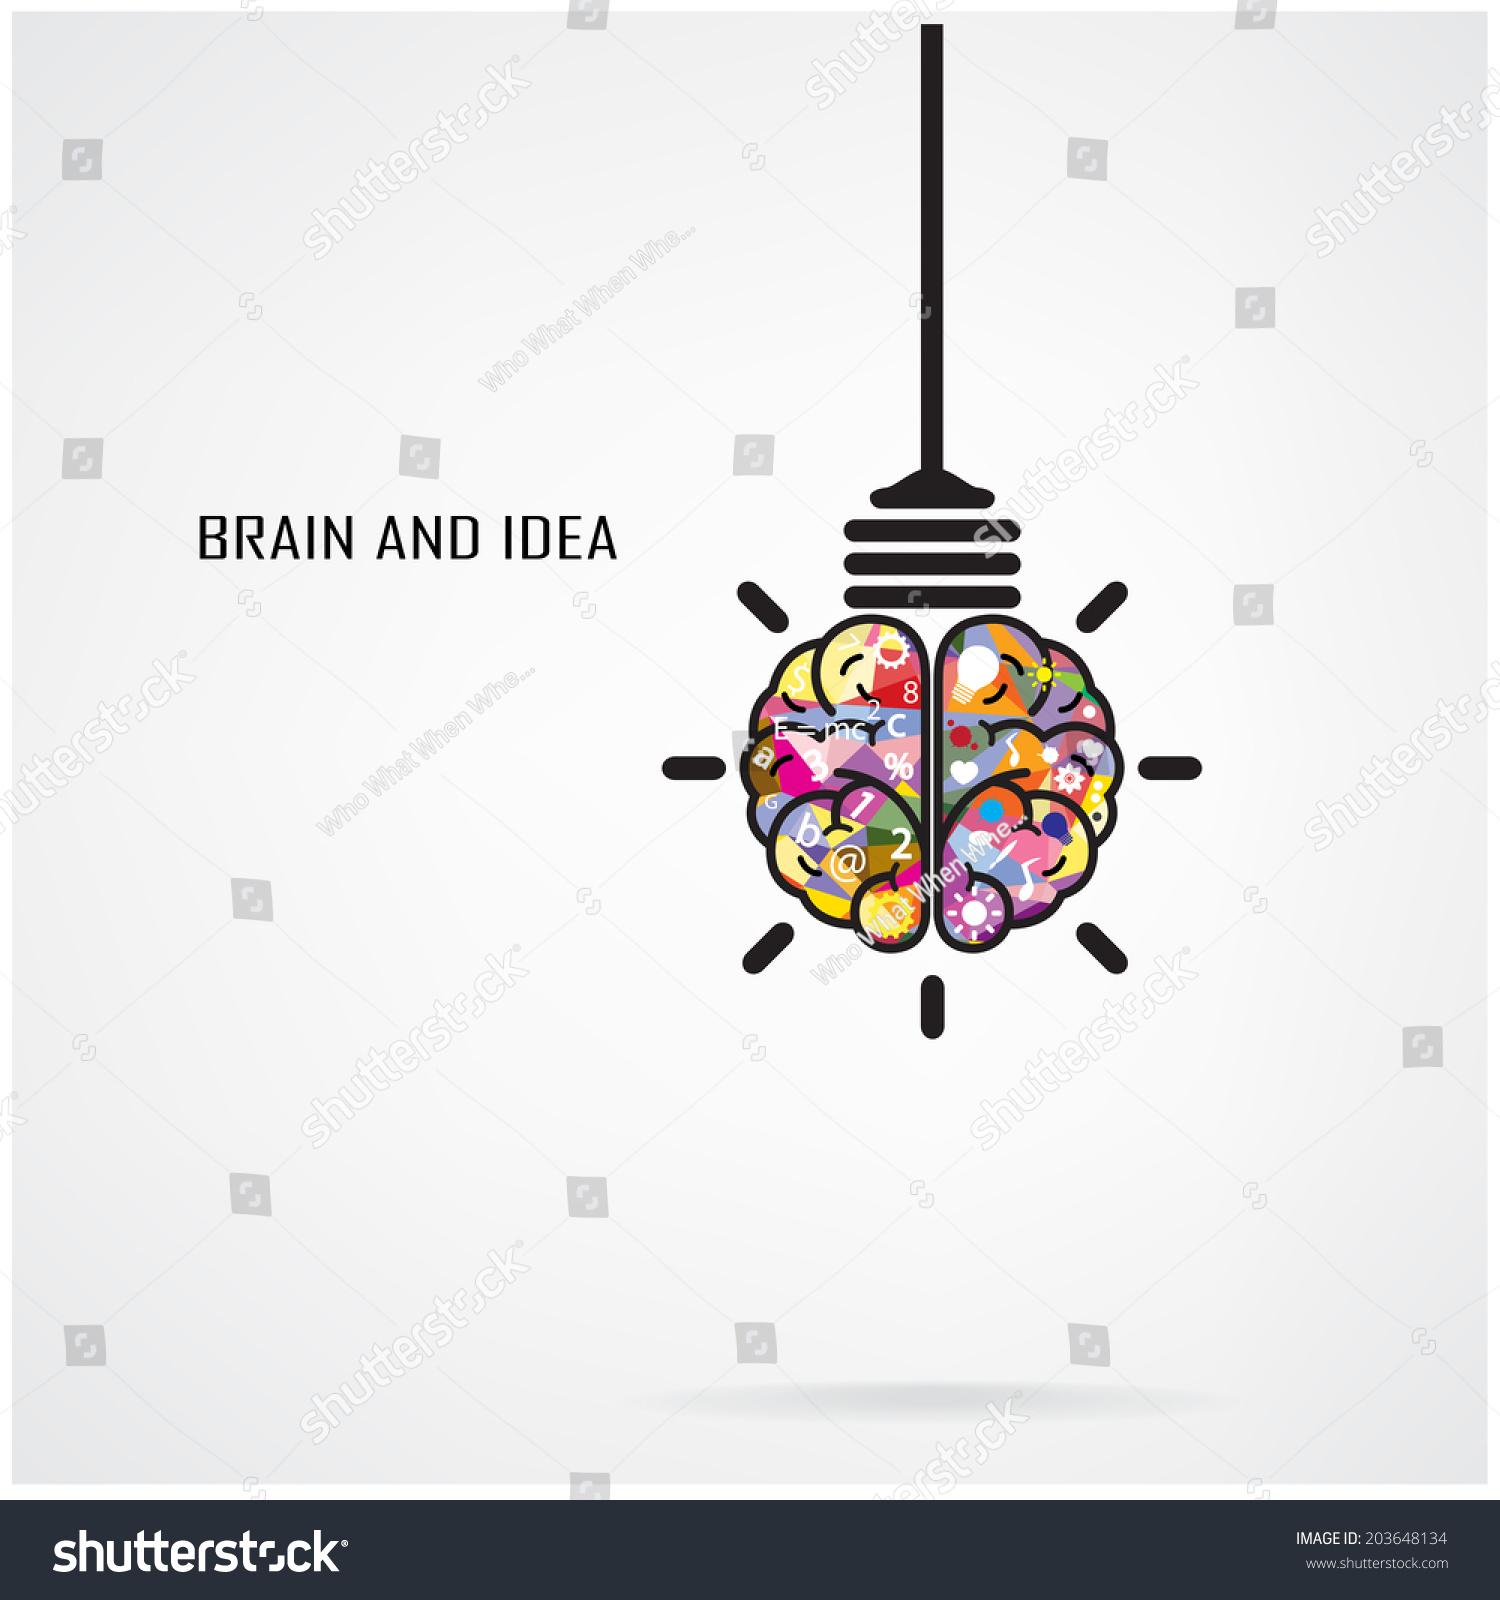 Idea Design 6 Save To A Lightbox